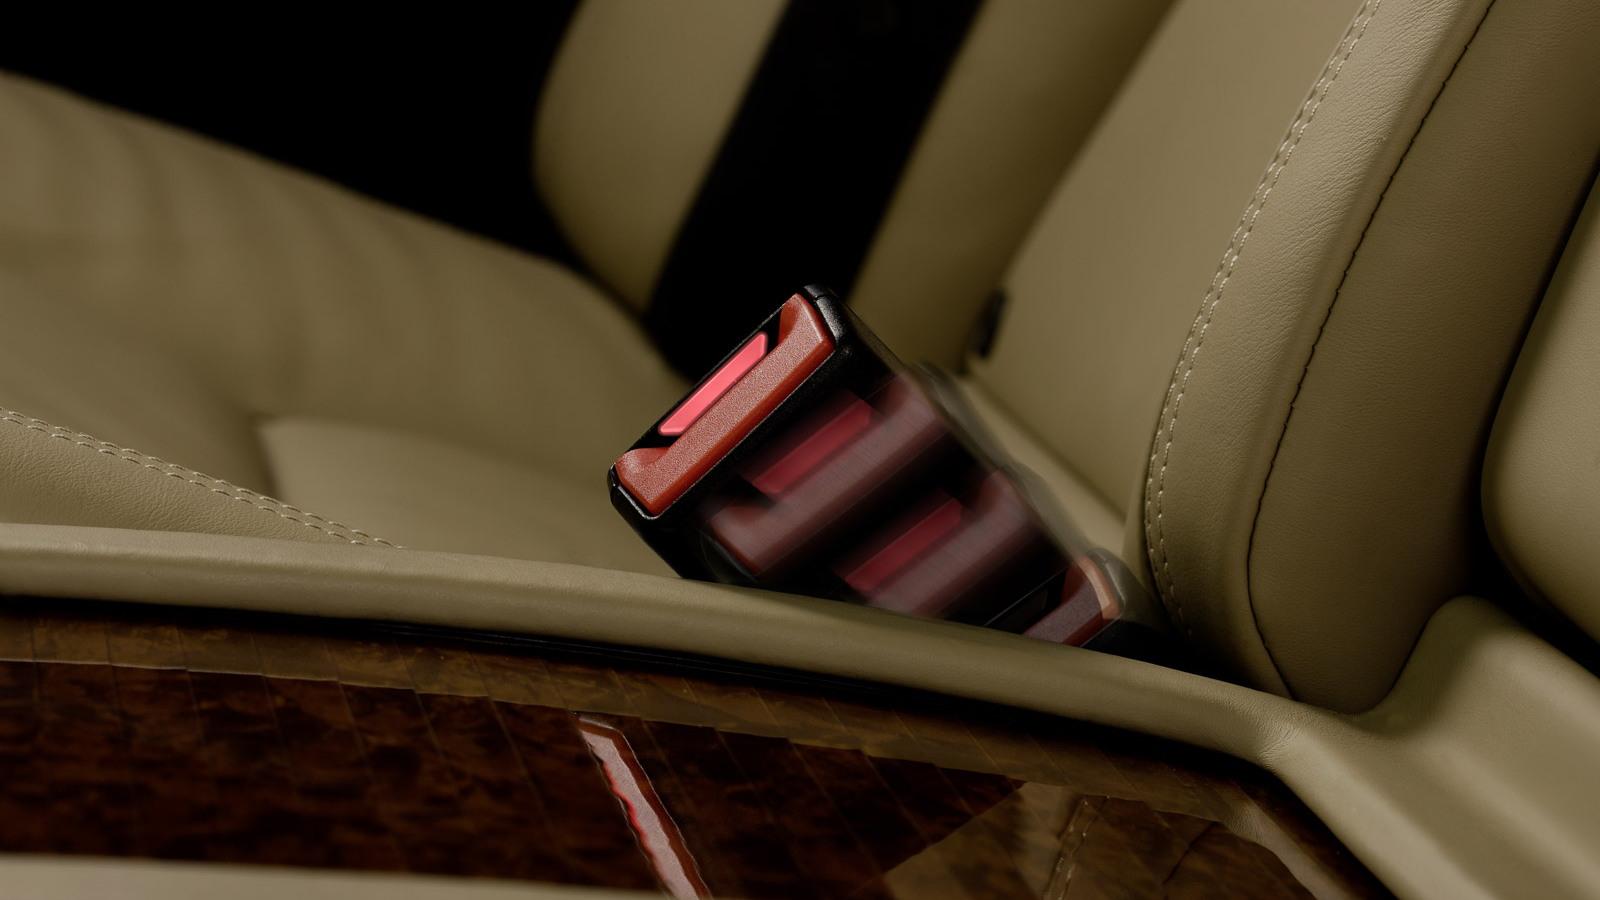 Mercedes-Benz rear active seat-belt buckle